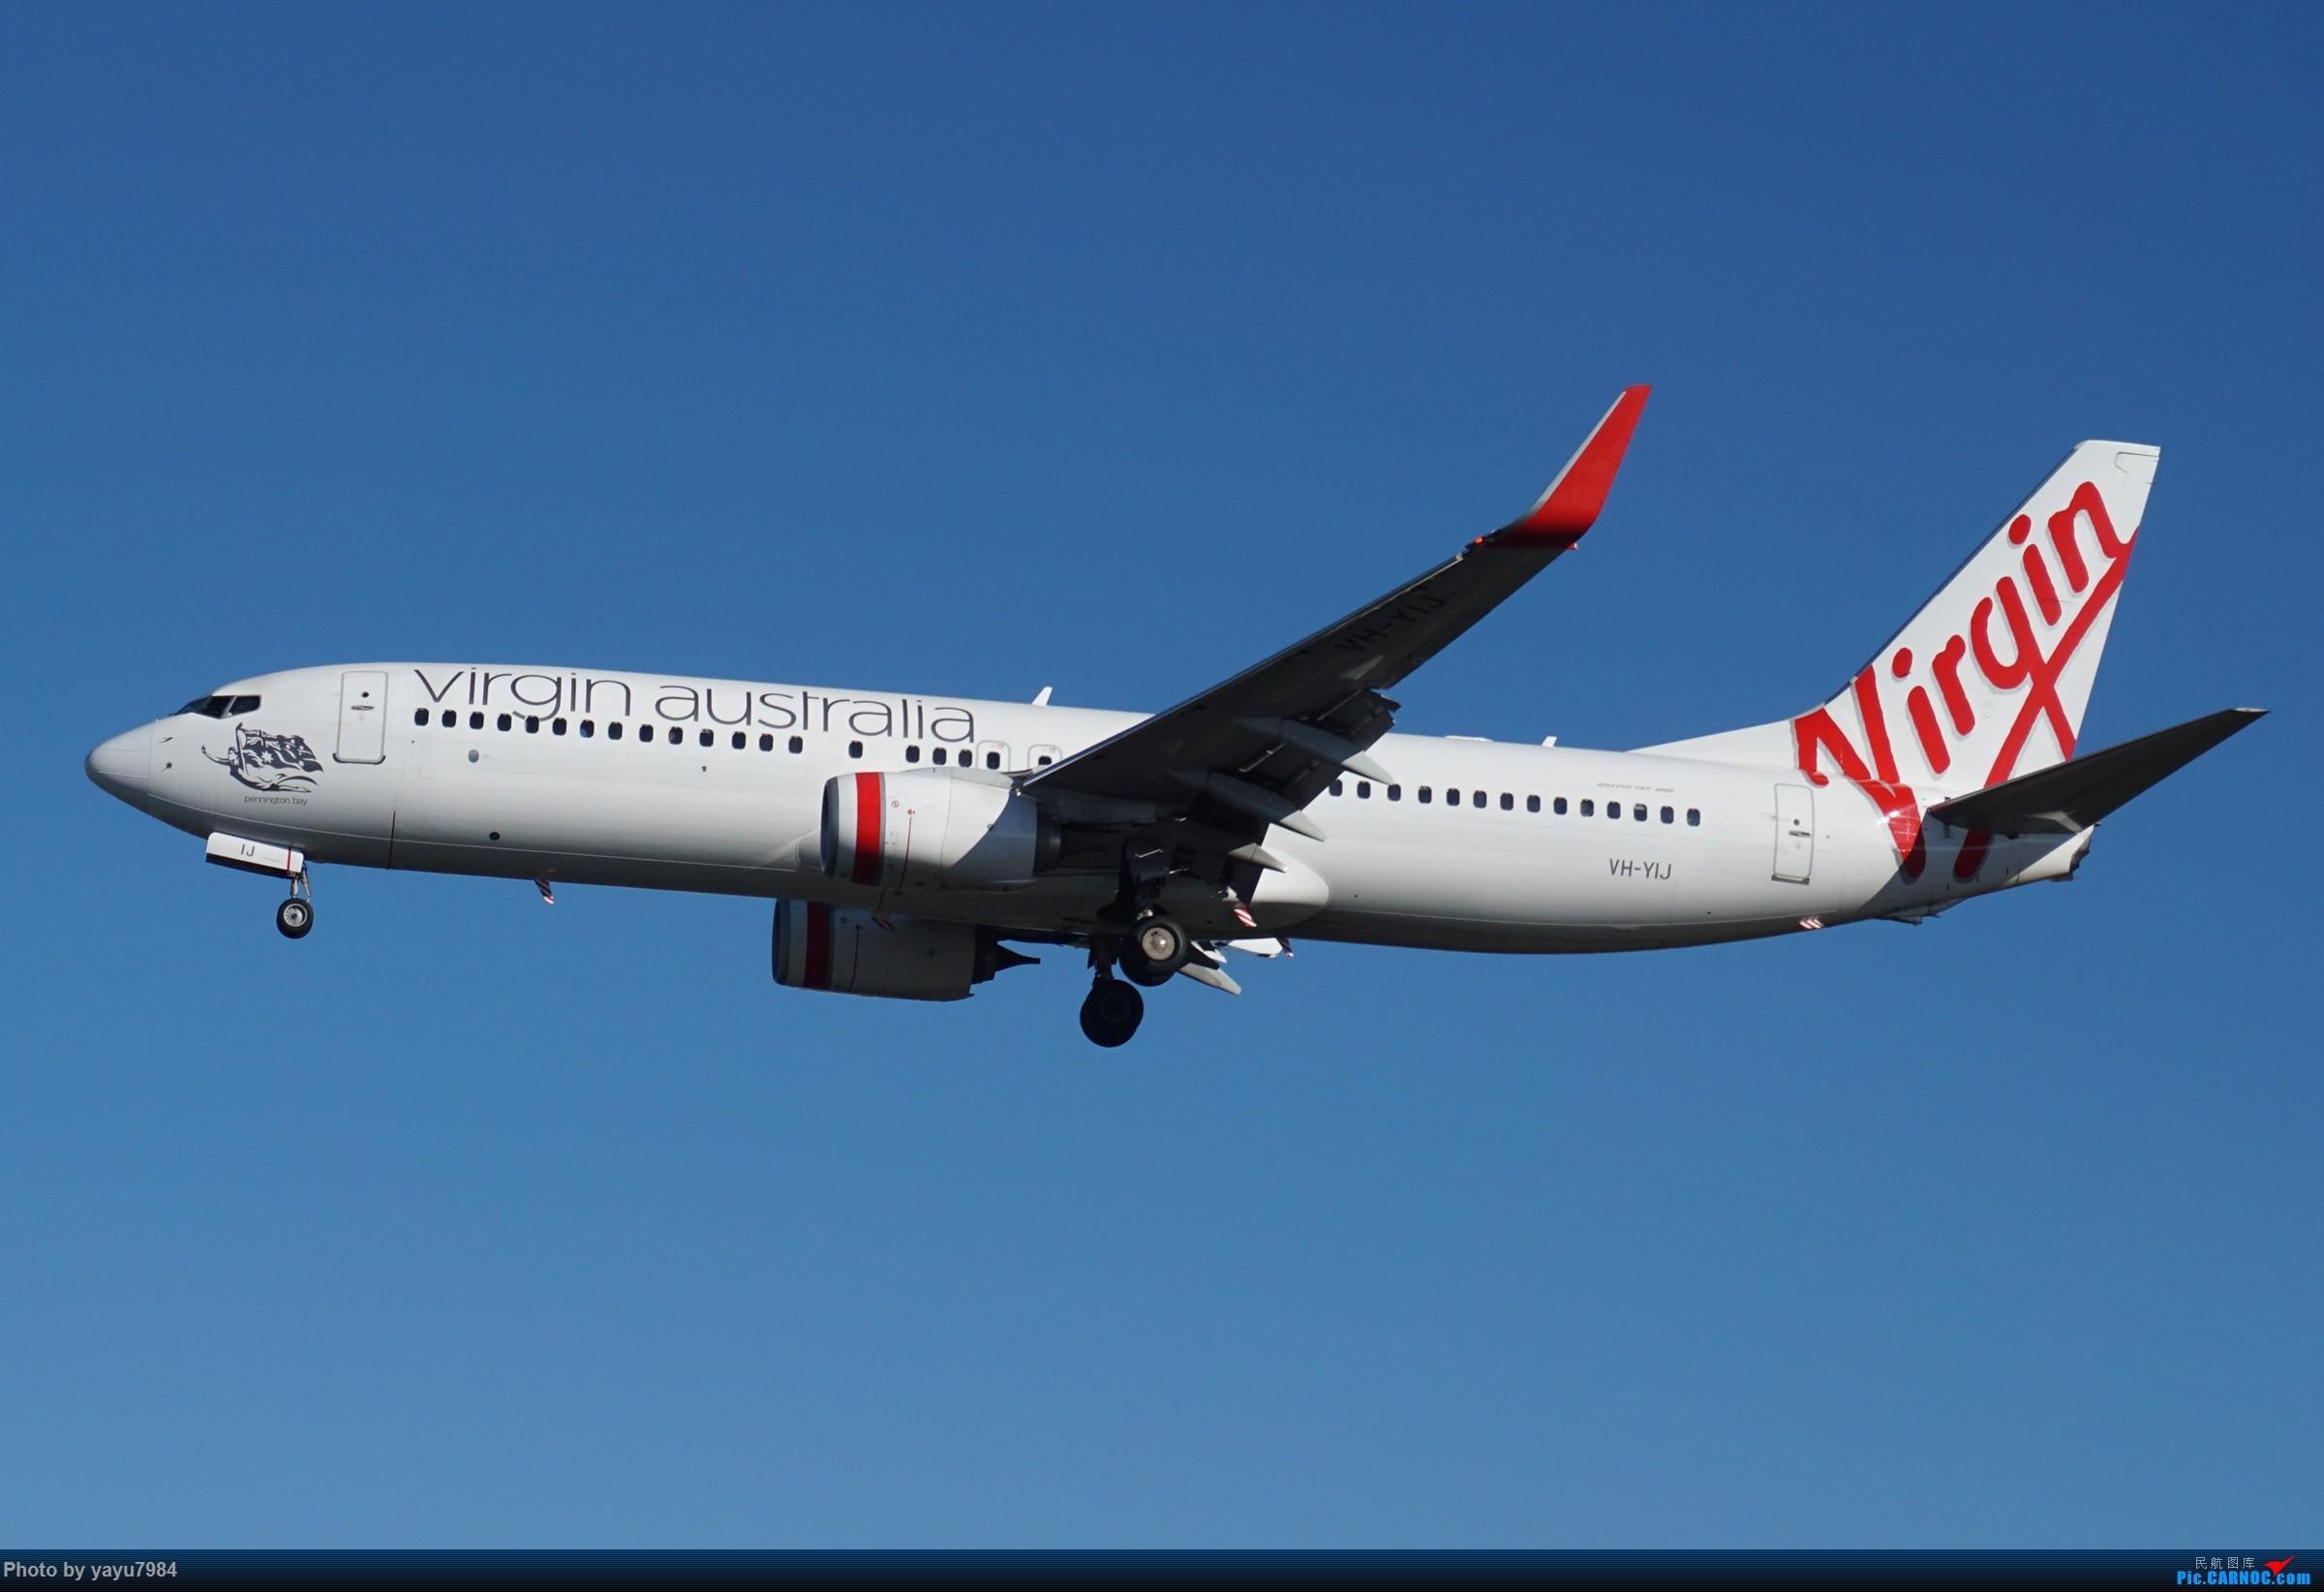 Re:[原创][SYD] 晨悉尼,16R扎堆到达 BOEING 737-800 VH-YIJ 澳大利亚悉尼金斯福德·史密斯机场